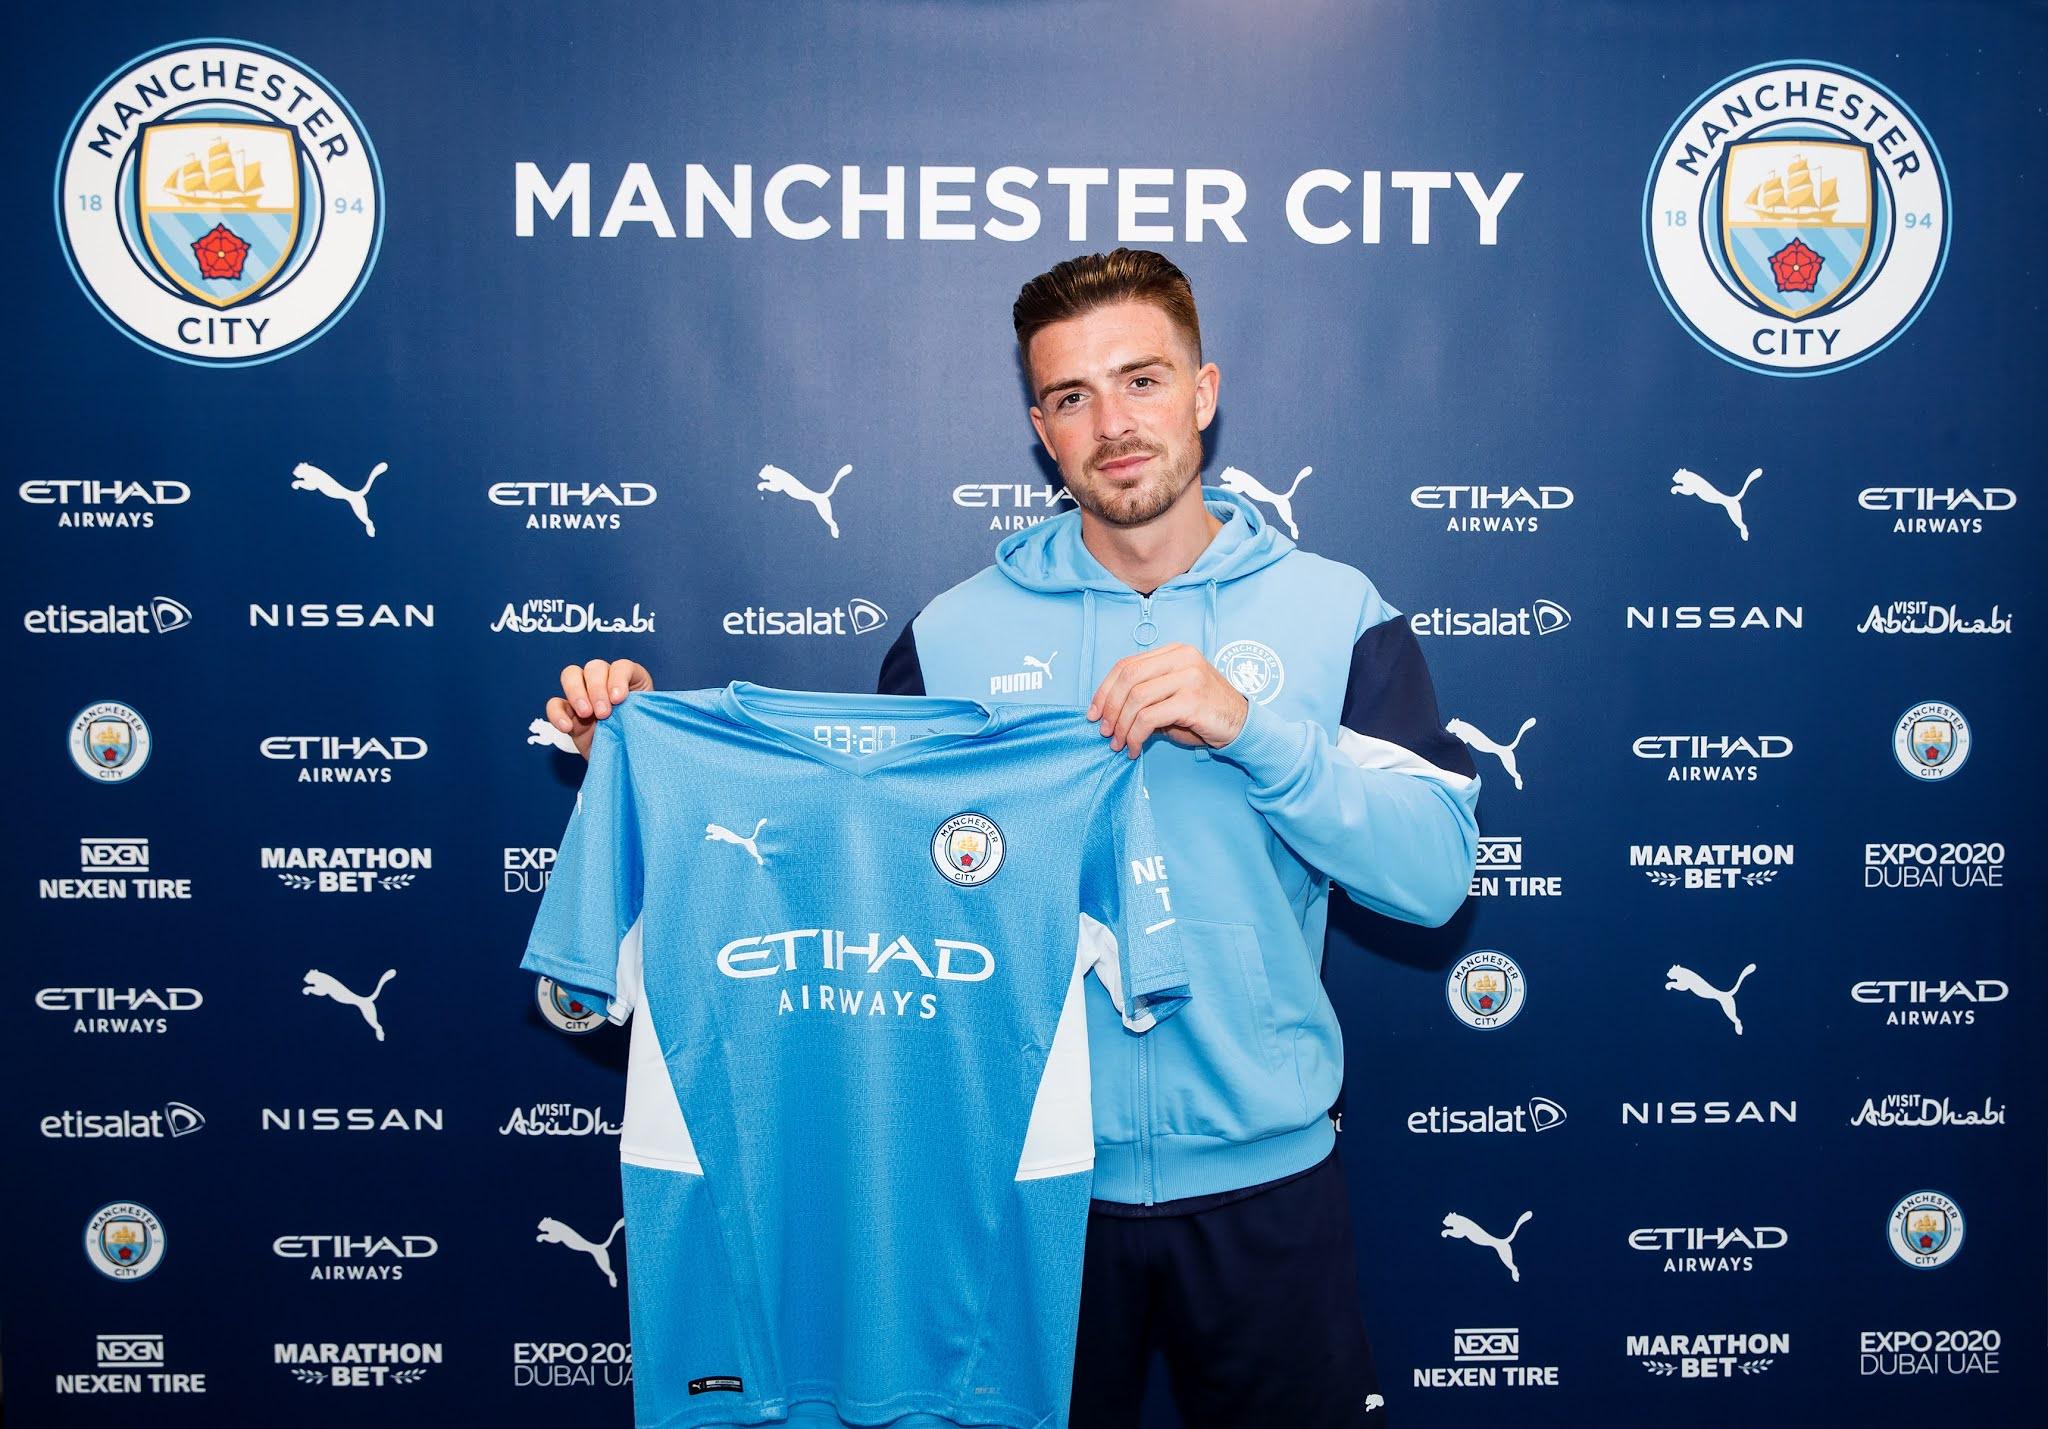 Newly-signed Manchester City midfielder Jack Grealish